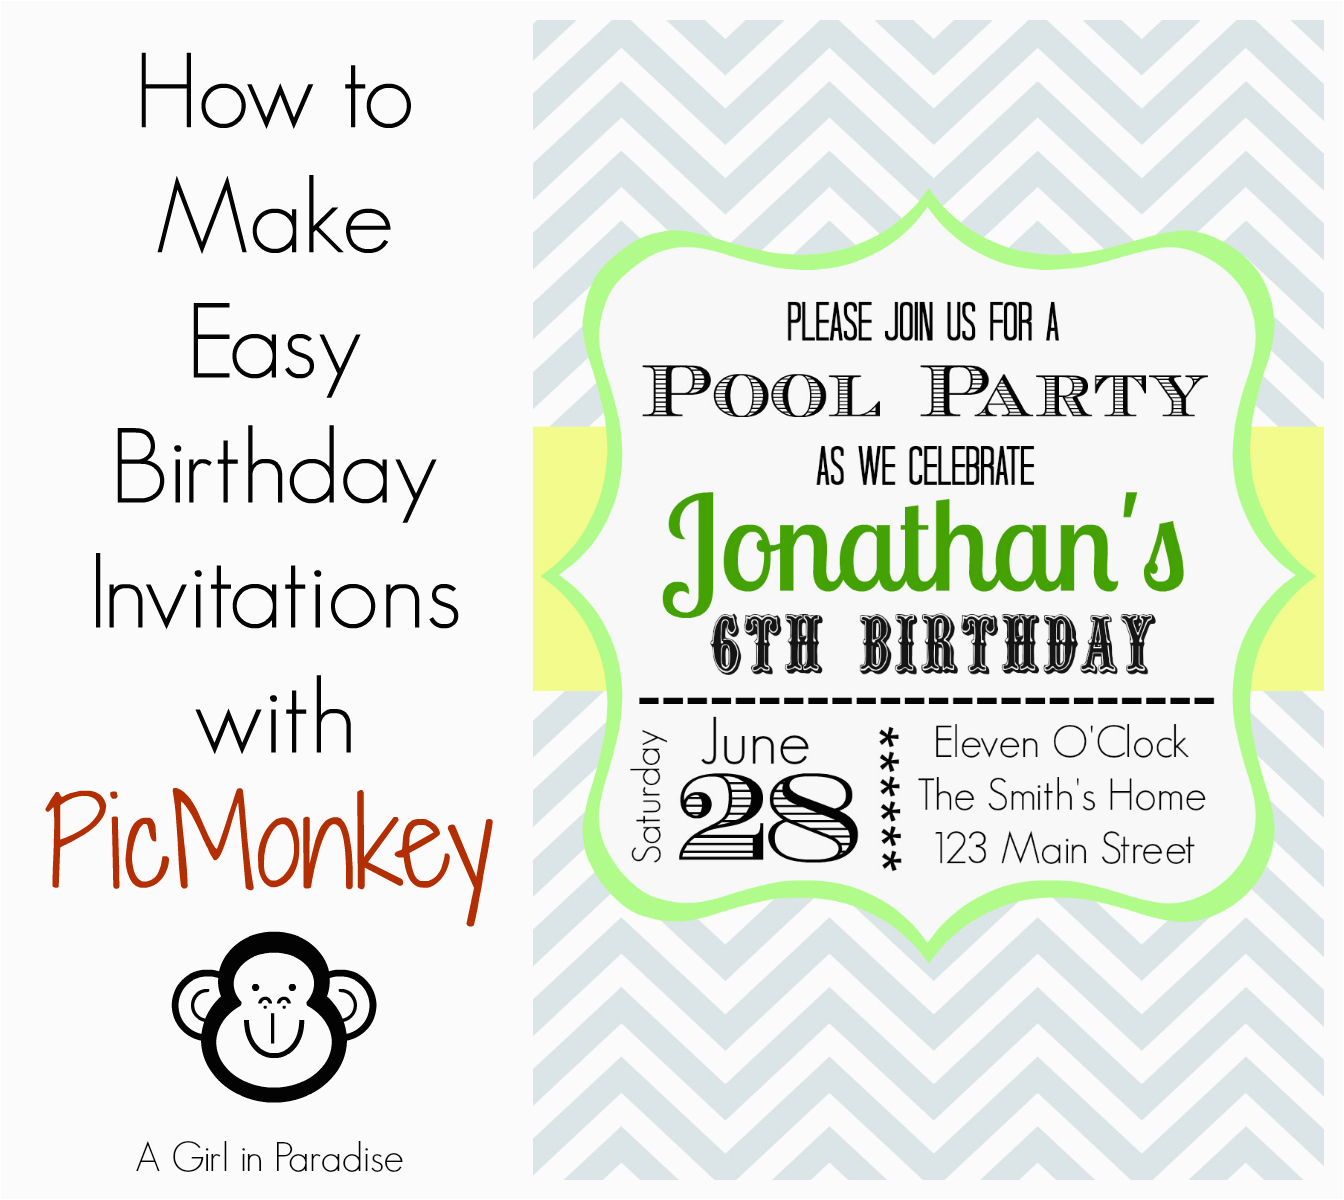 Where to Make Birthday Invitations How to Make Birthday Invitations In Easy Way Birthday